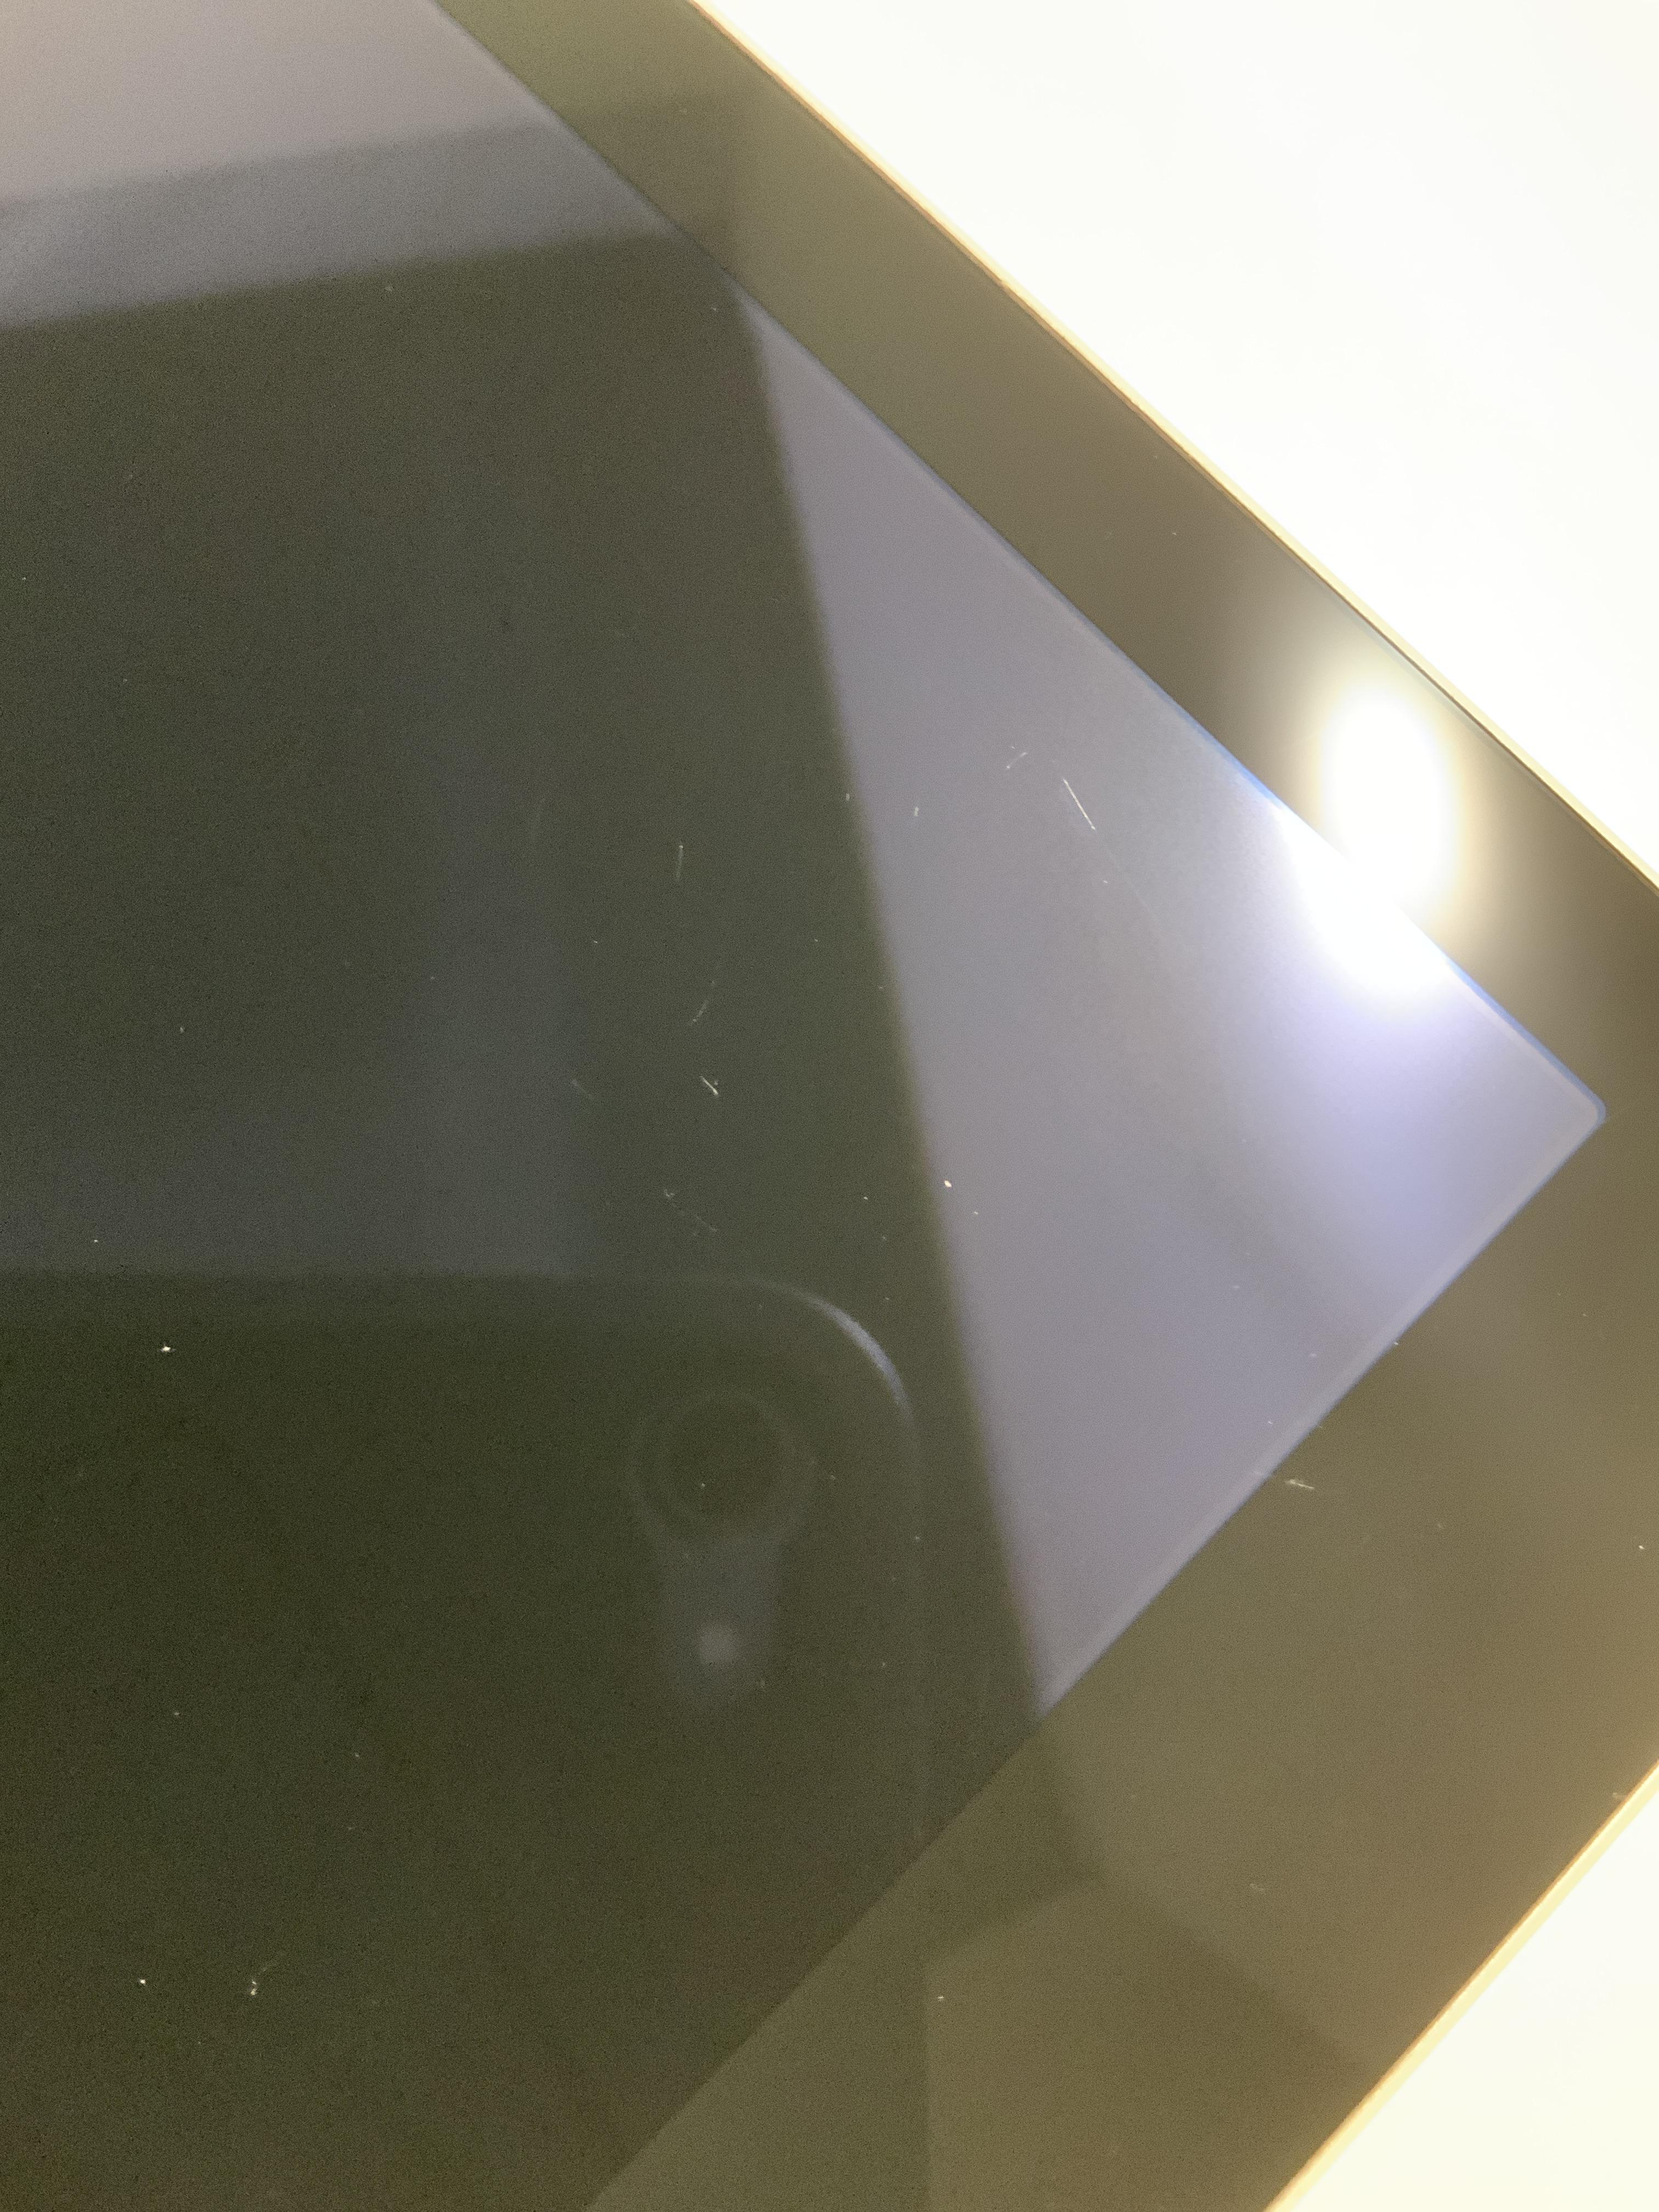 iPad Air 2 Wi-Fi + Cellular 32GB, 32GB, Space Gray, immagine 2